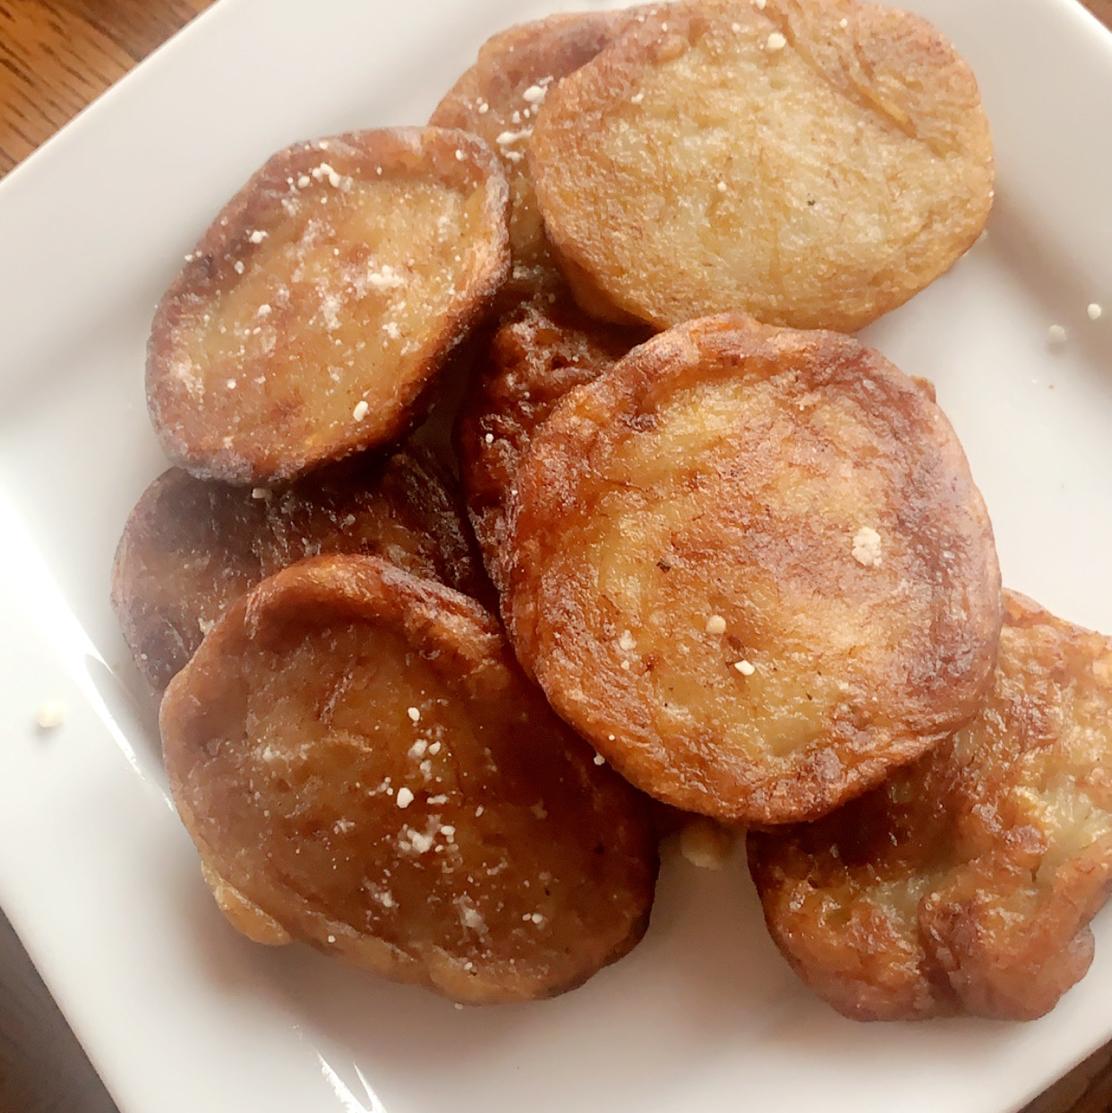 Jemput Jumput (Banana Fritters) Keniese M Giraud